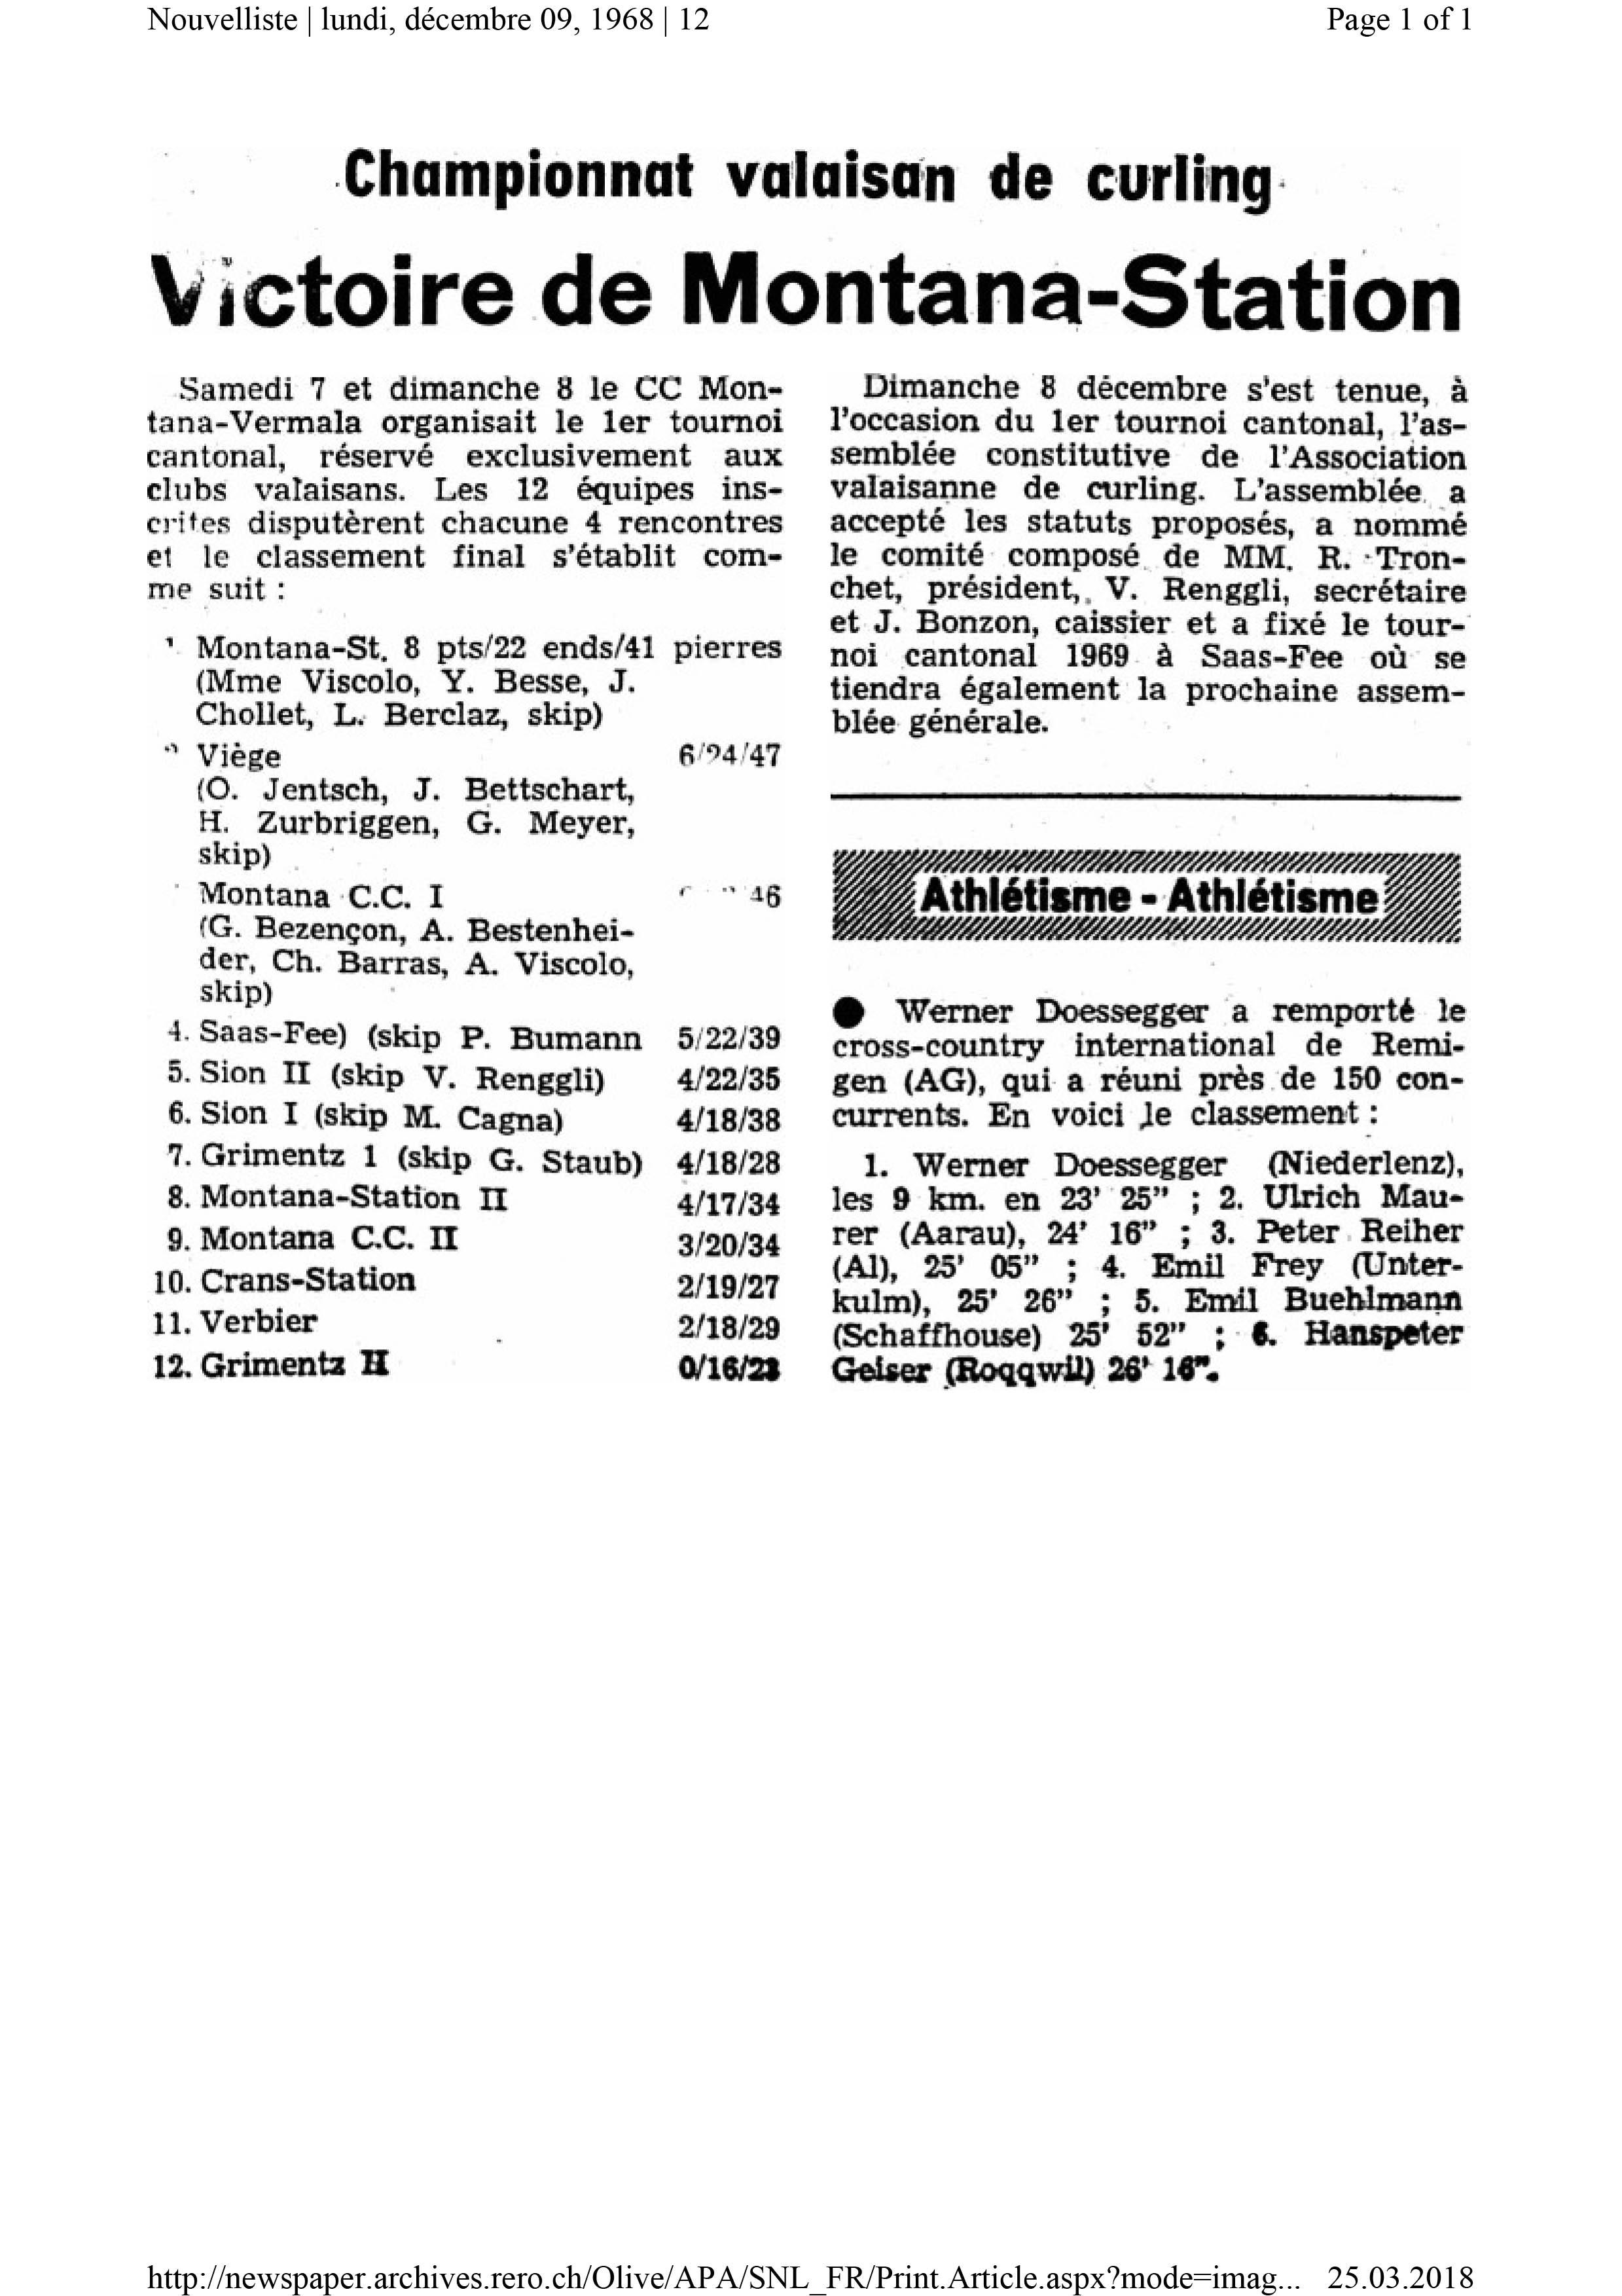 Championnat_VS_CURLING_1968.jpg